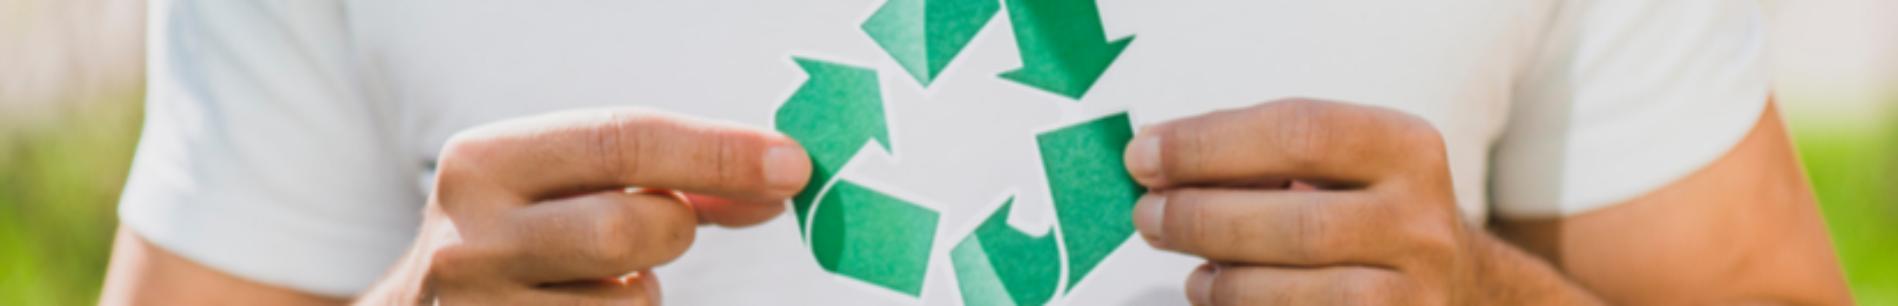 Bandeau Recyclage ©Freepik